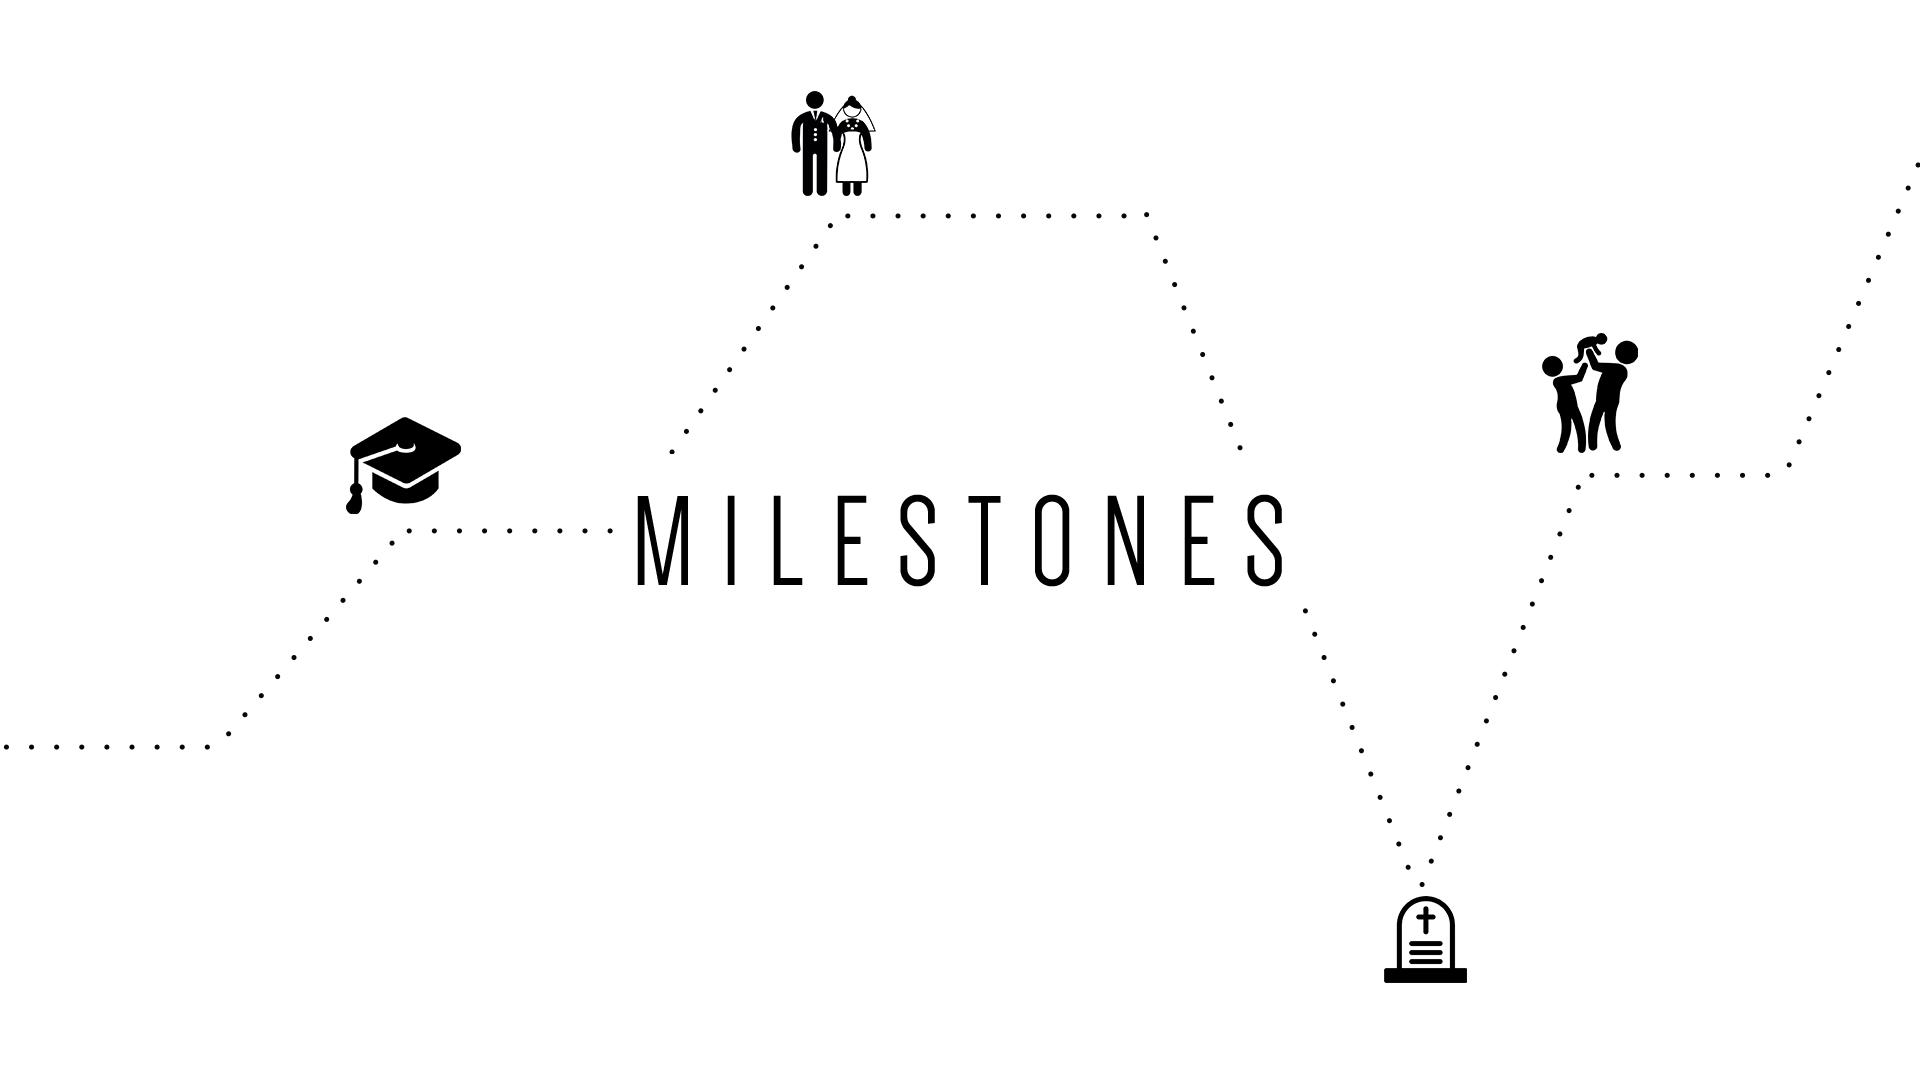 Milestones – Church Sermon Series Ideas